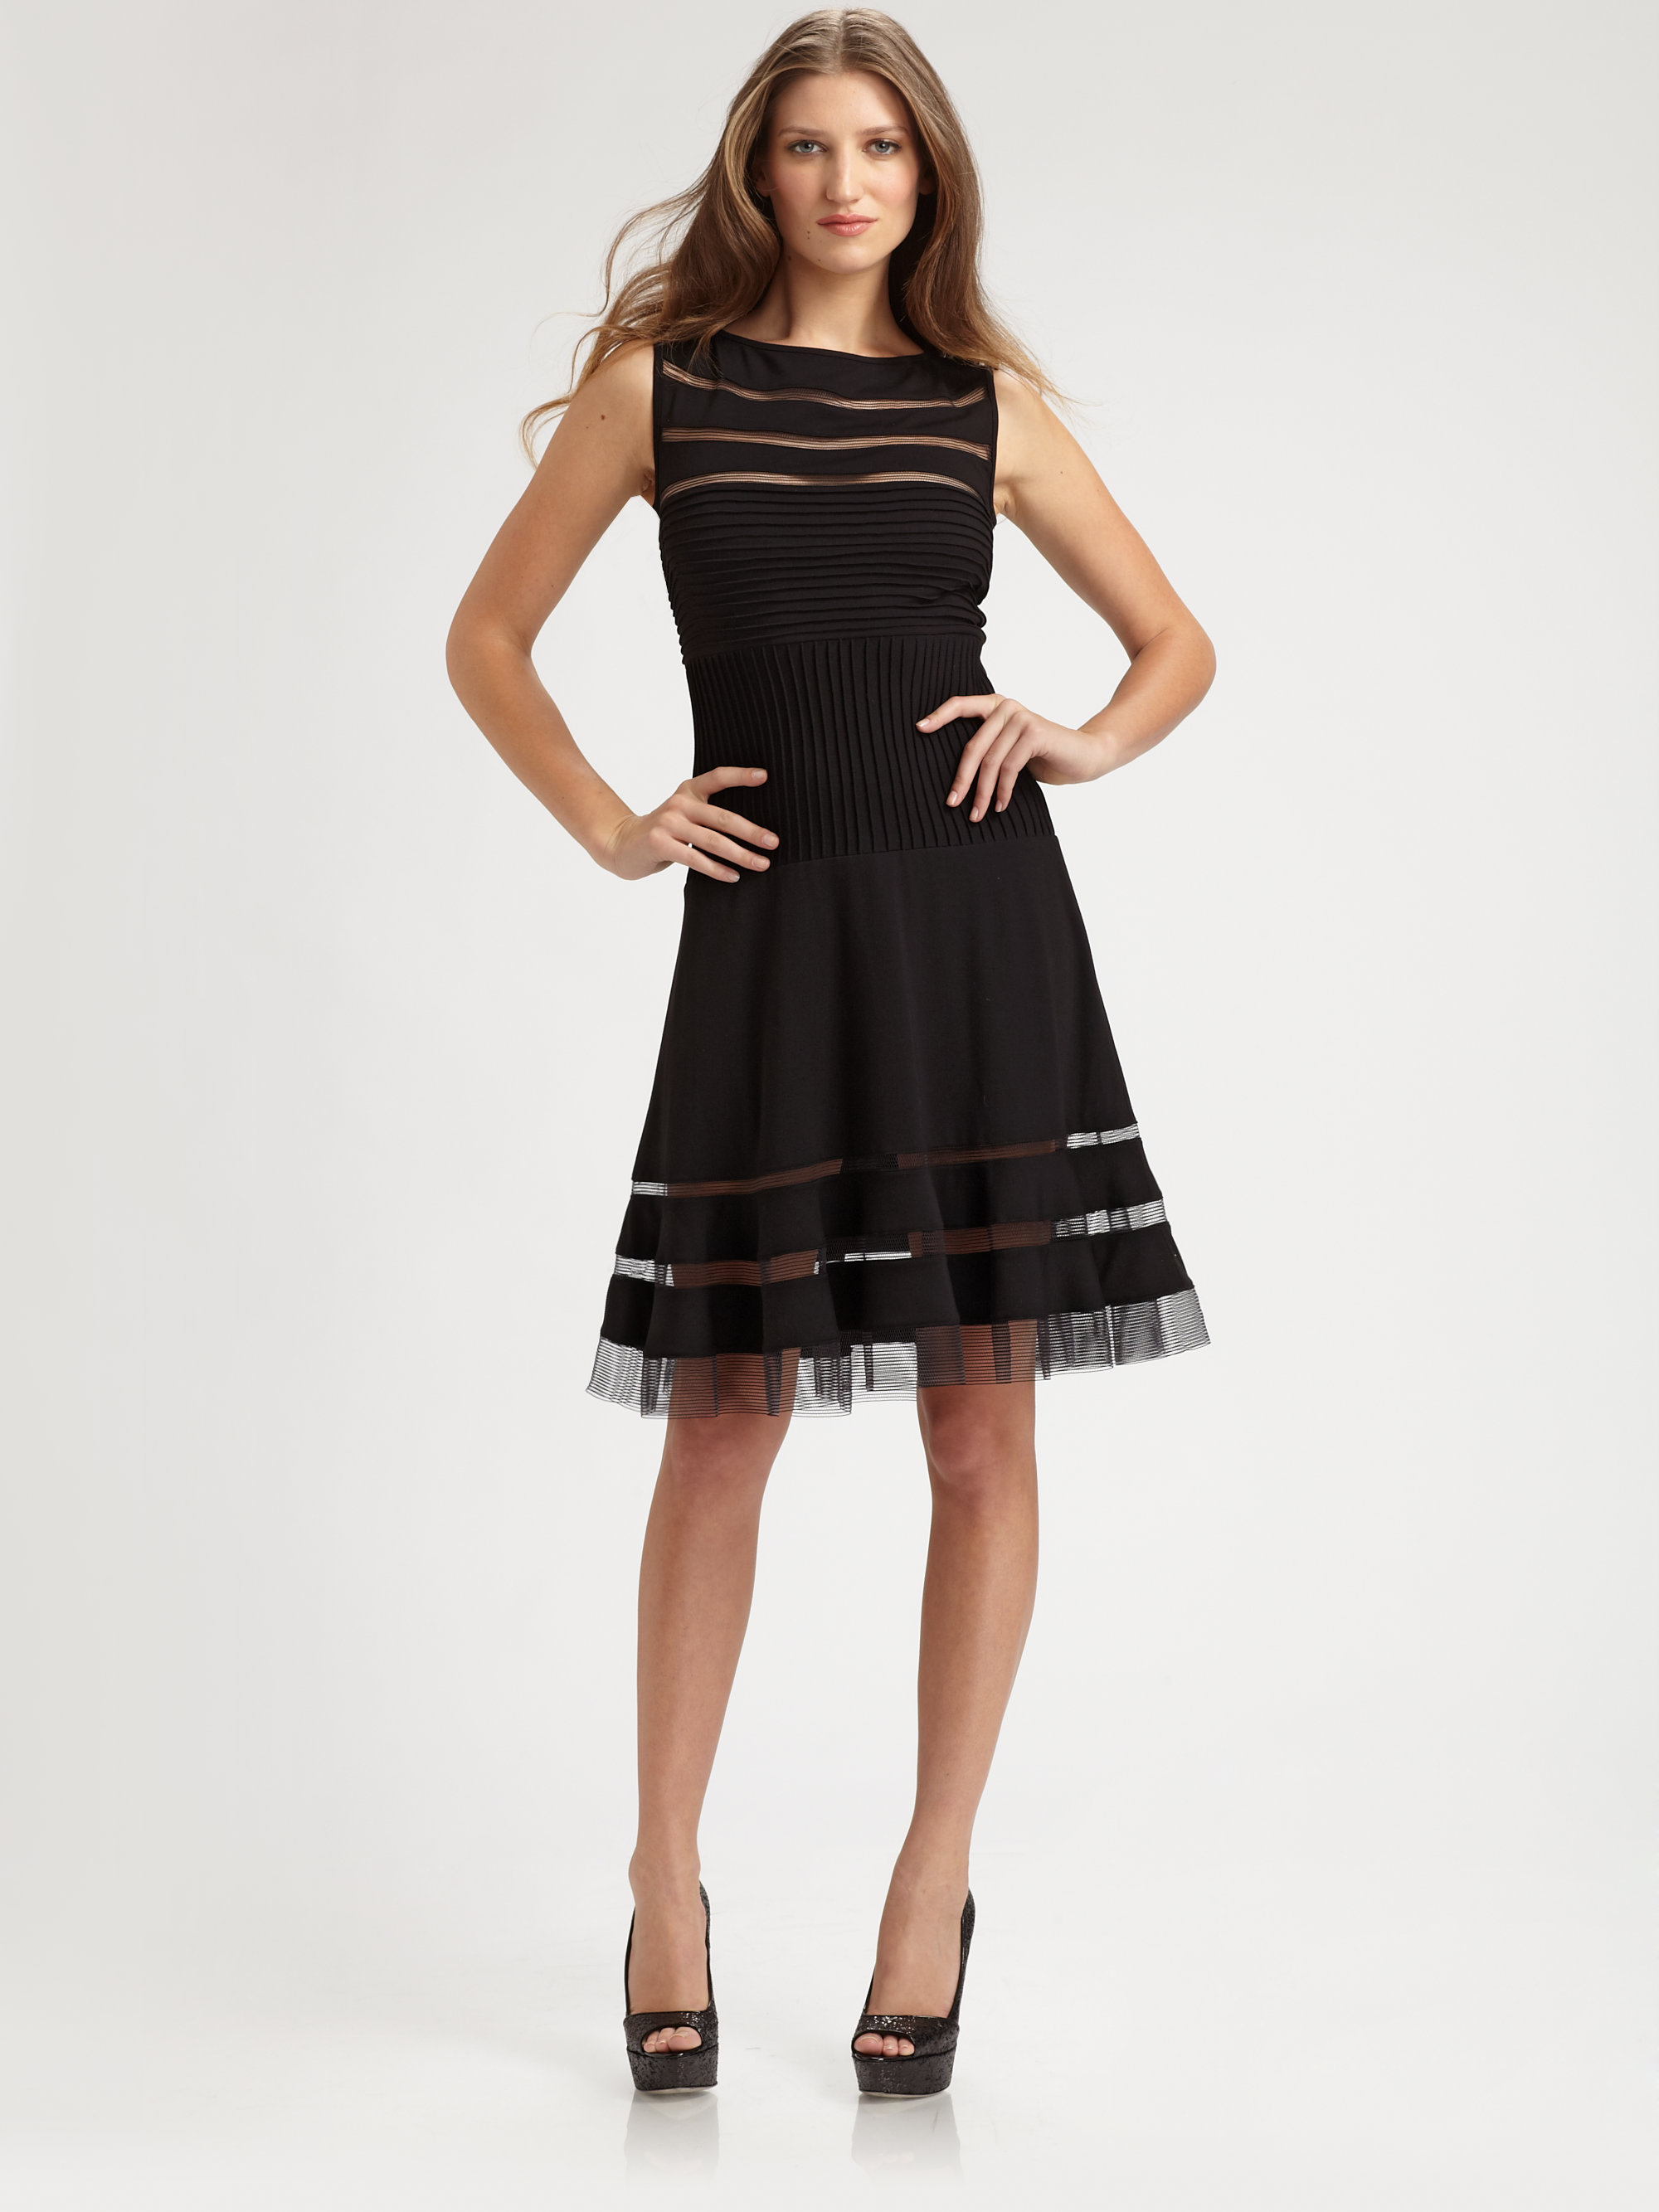 Tadashi Shoji Pintucked Inset Dress In Black Lyst